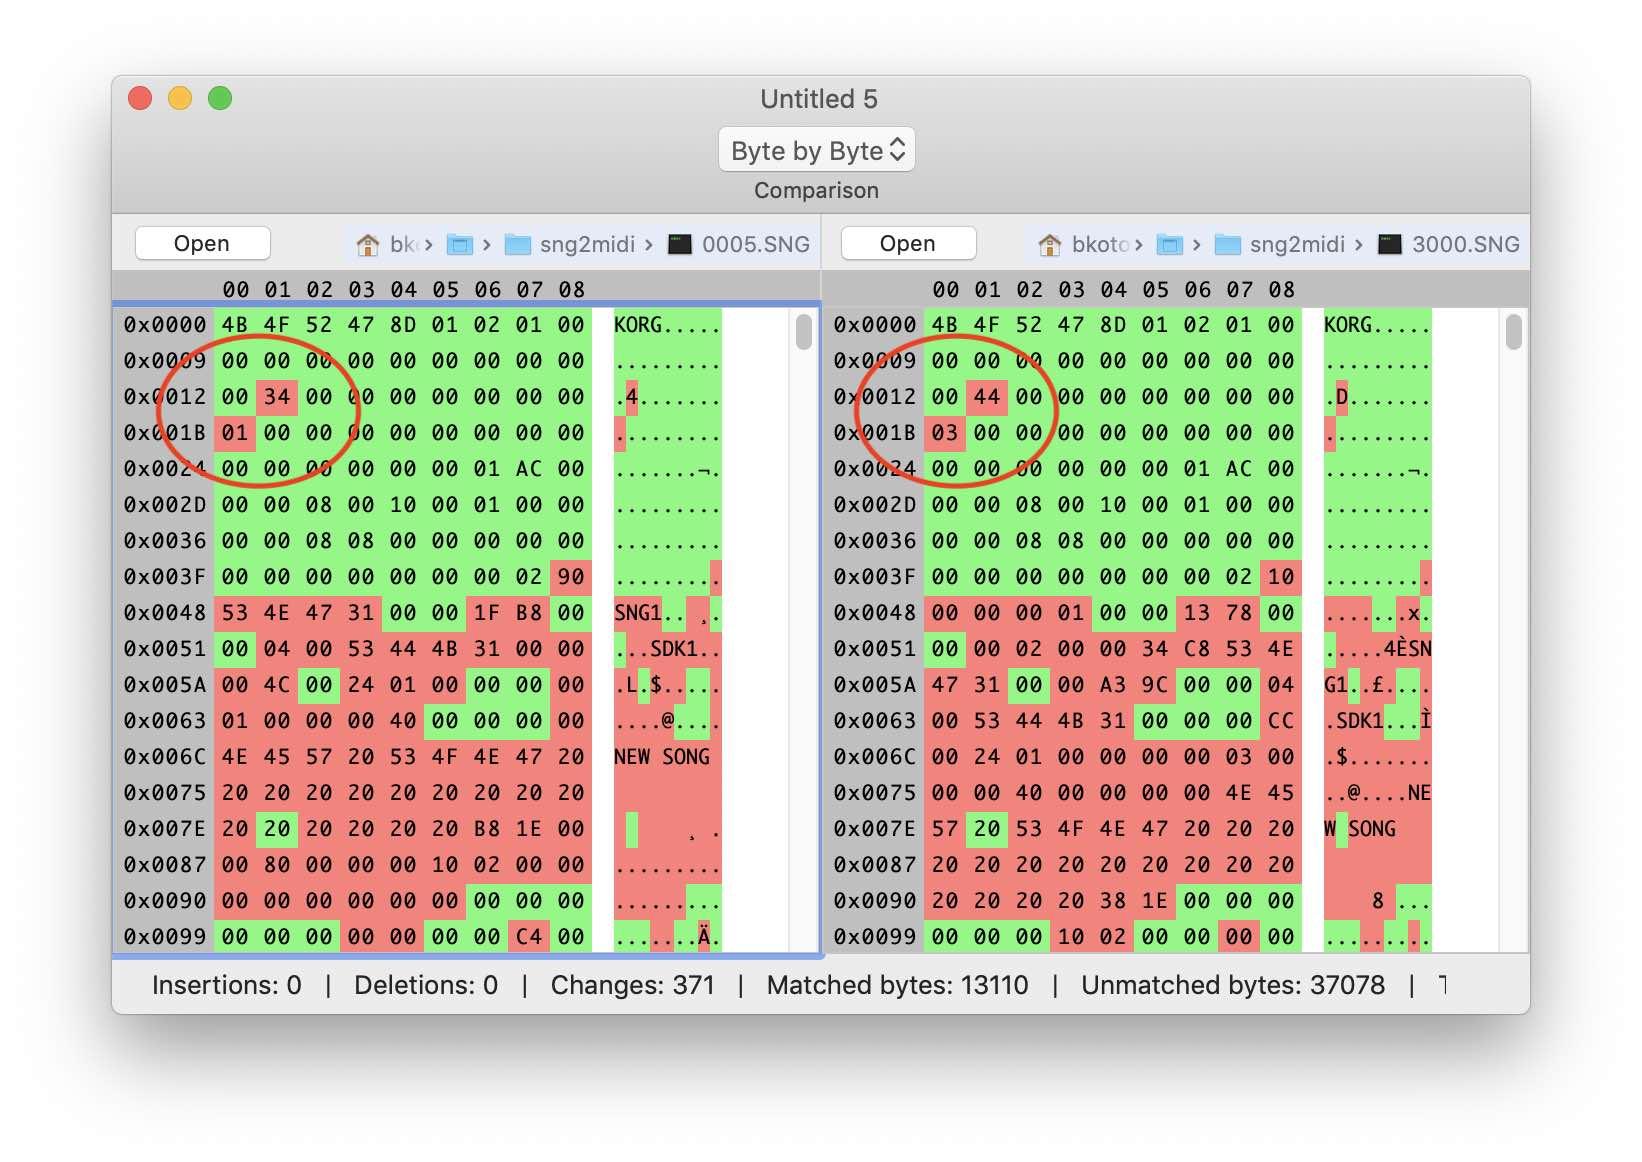 Реверс-инжиниринг бинарного формата на примере файлов Korg .SNG - 5